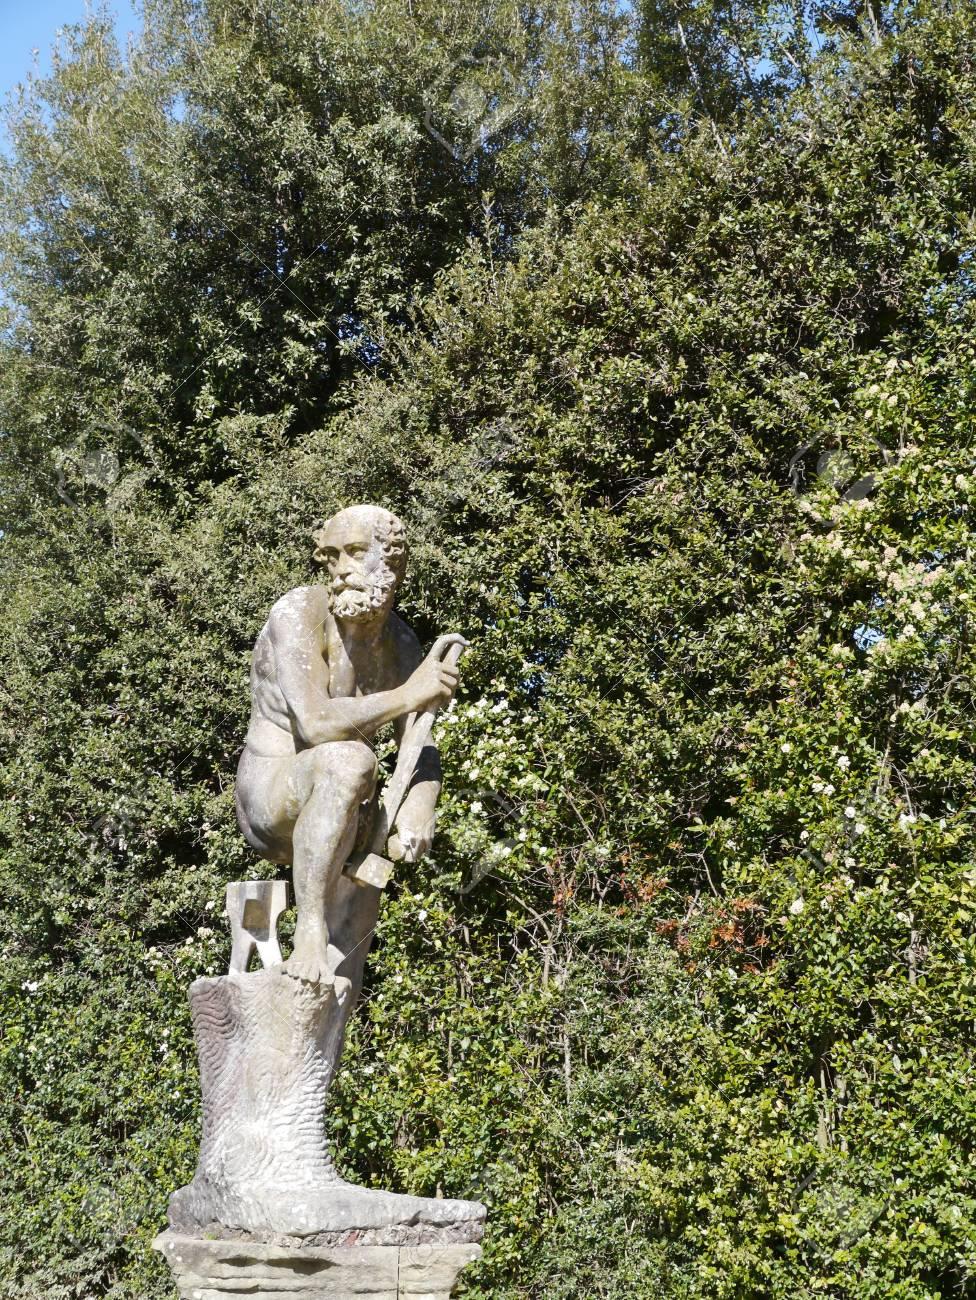 Sculpture in de boboli gardens in Florence in Italy Stock Photo - 19220772